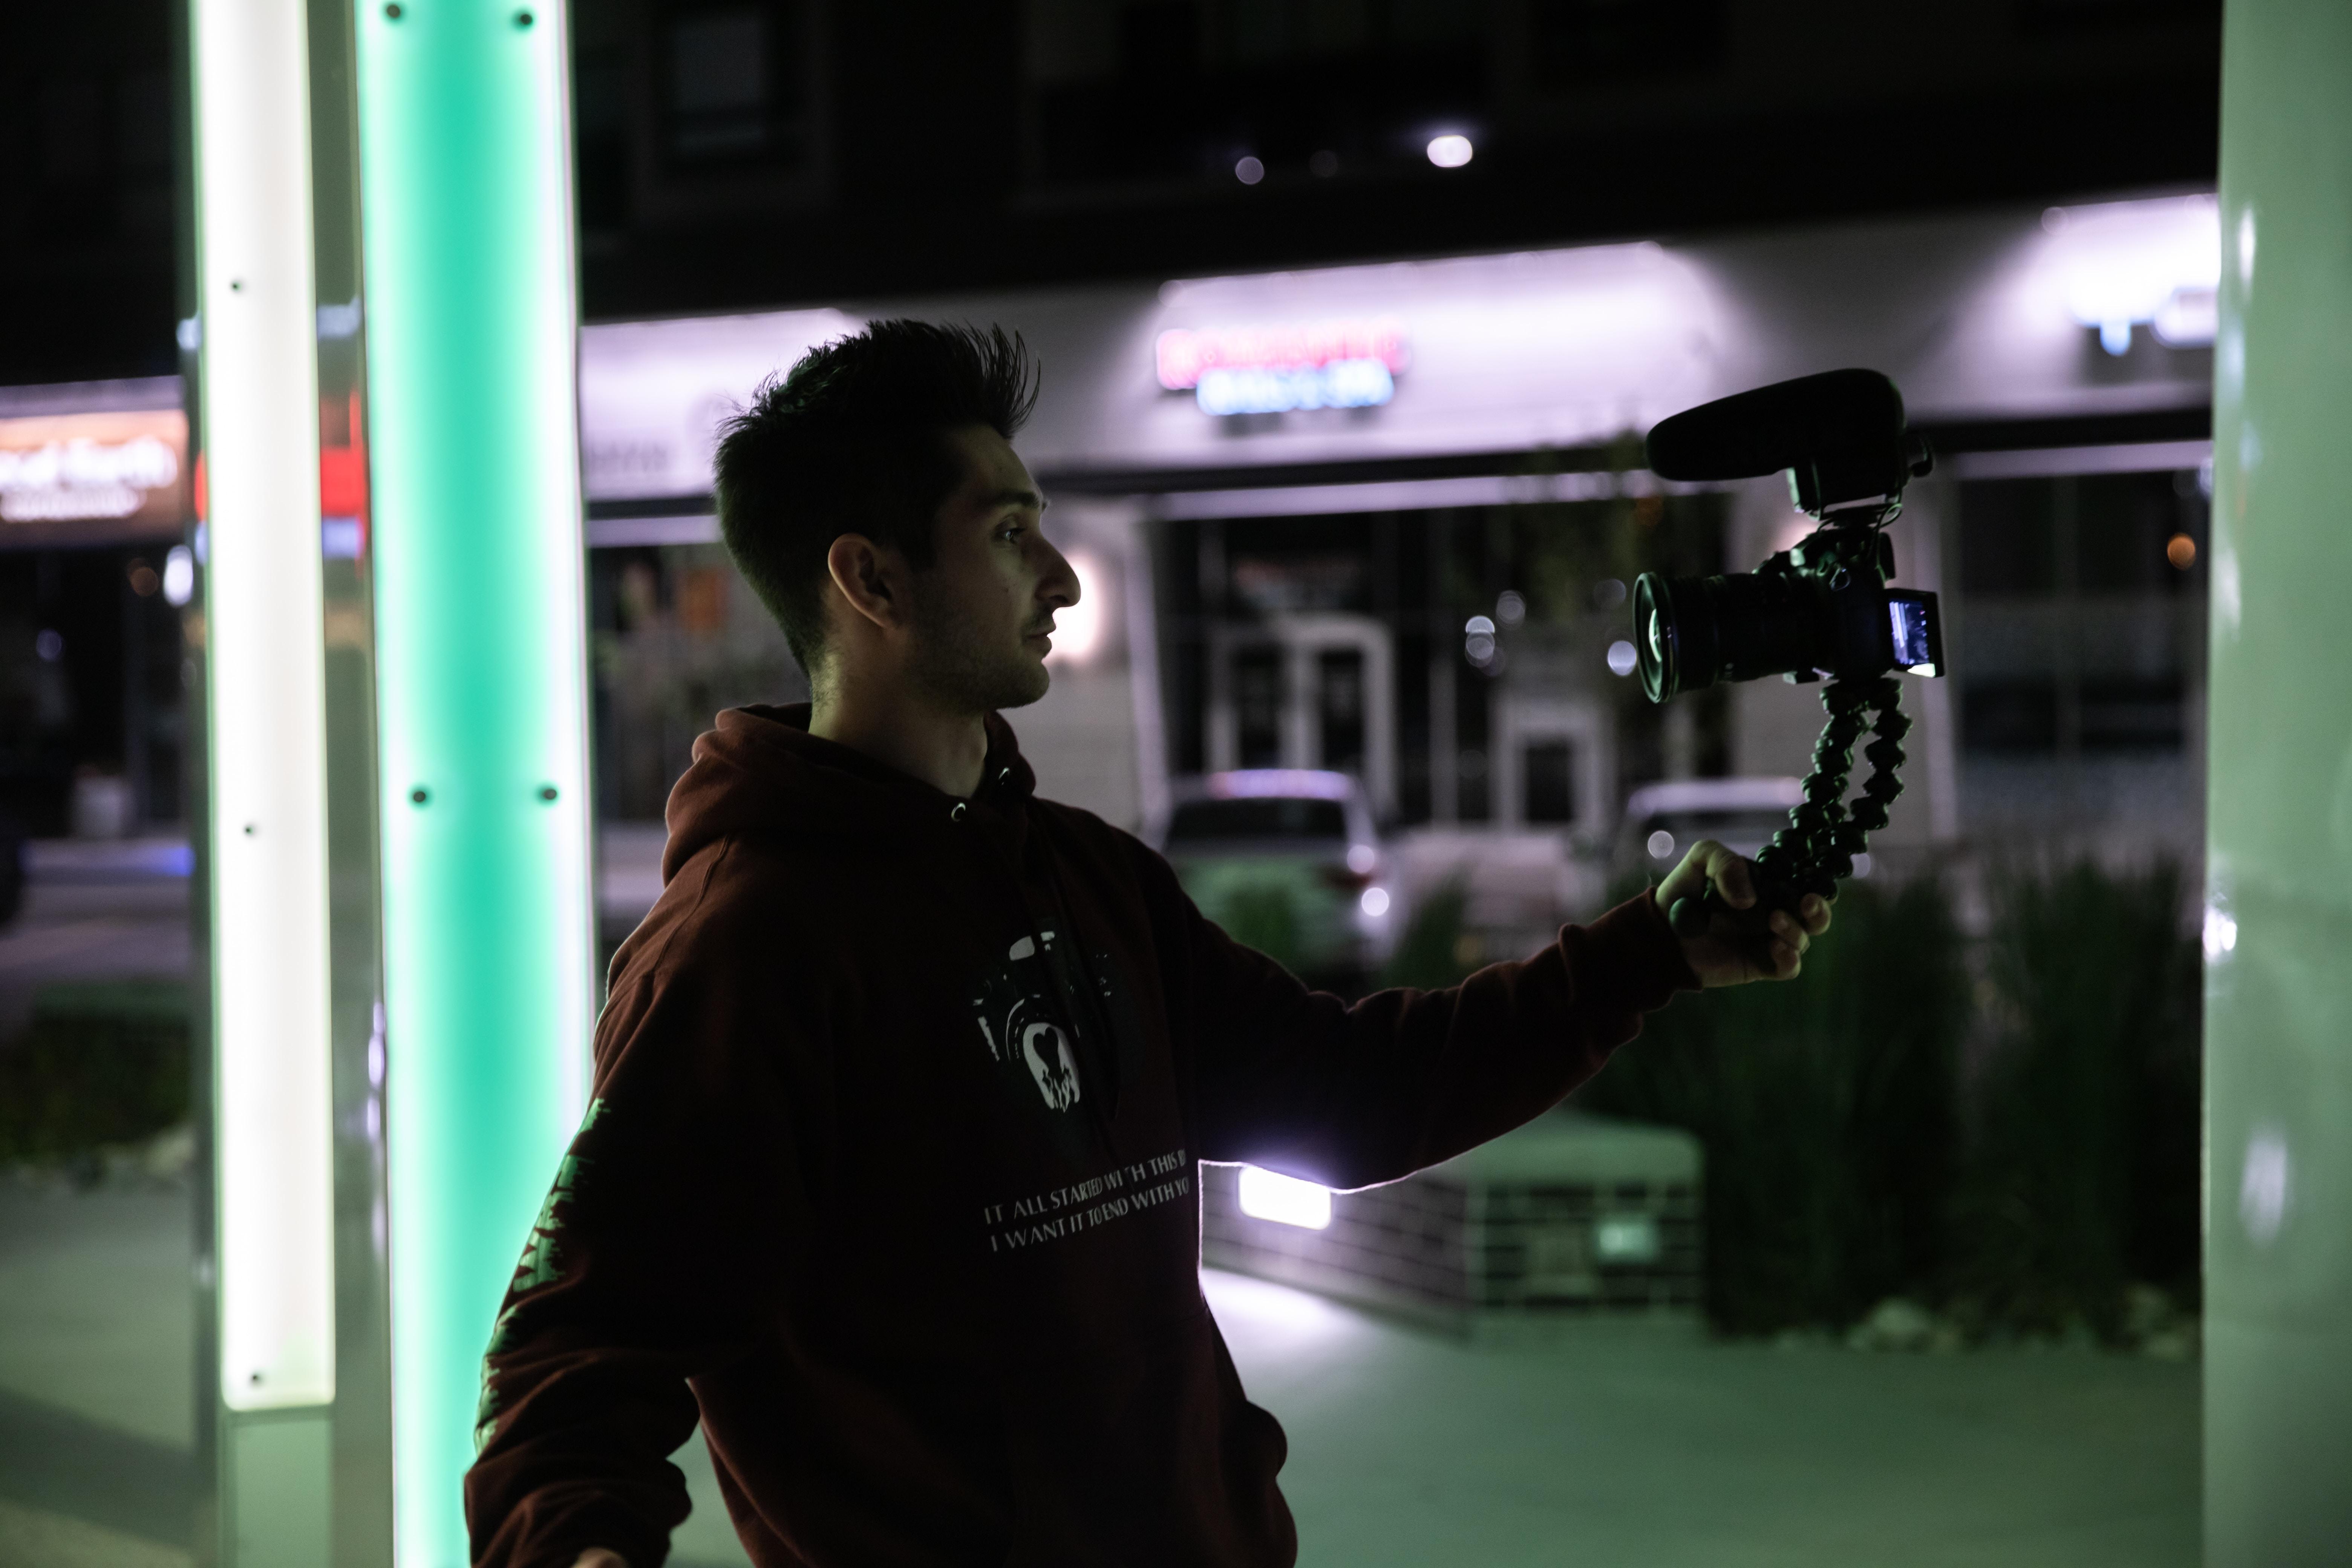 vlogger啥意思